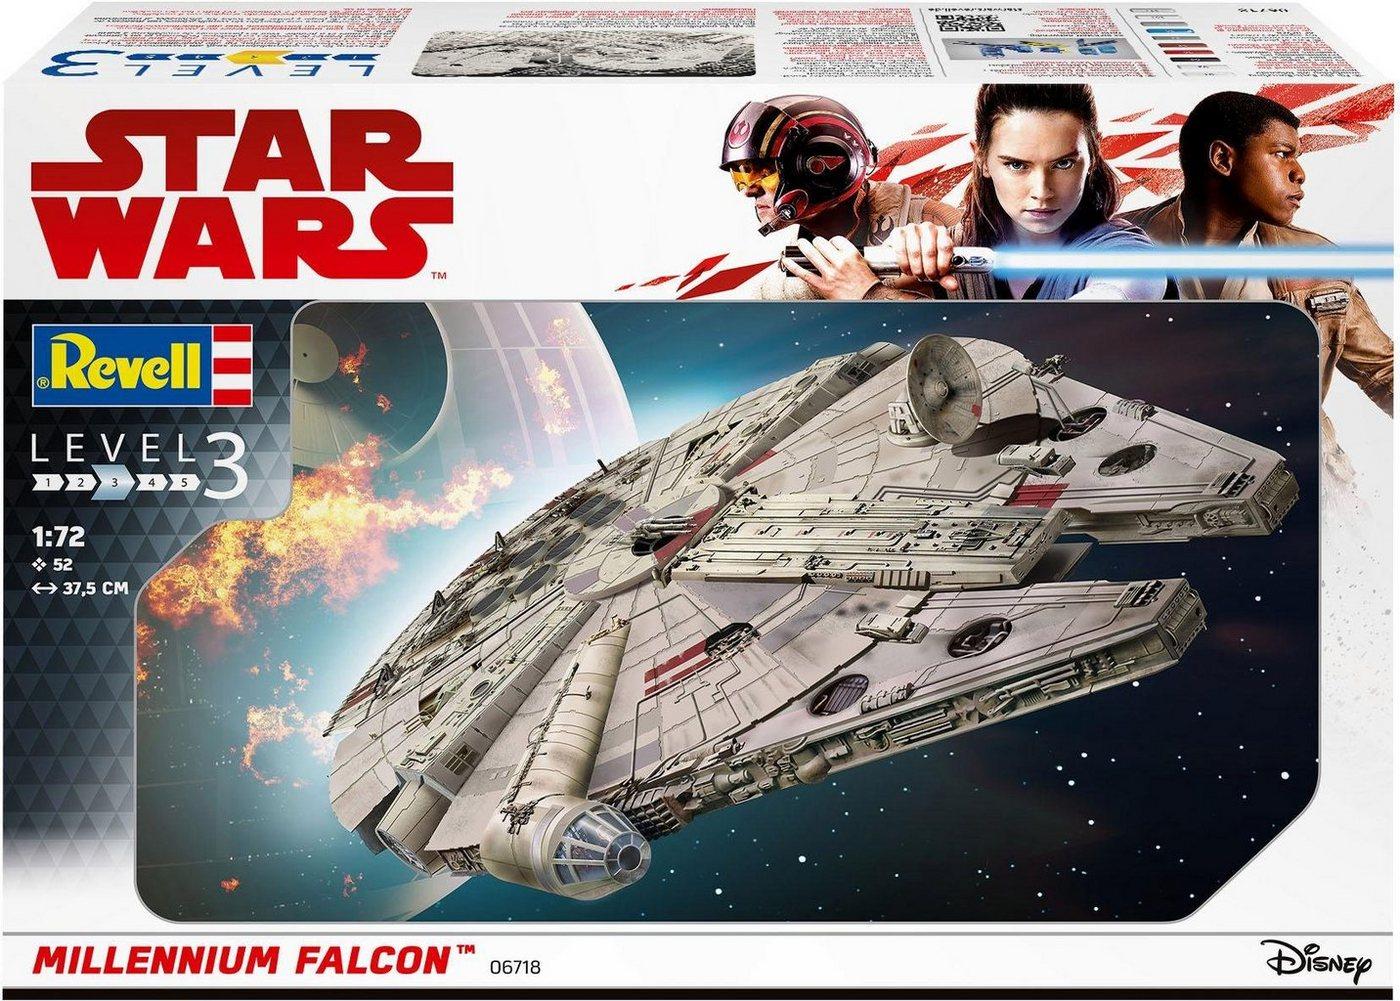 Revell Modellbausatz Raumschiff, Maßstab 1:72, »Dinsey Star Wars™ Millennium Falcon™«